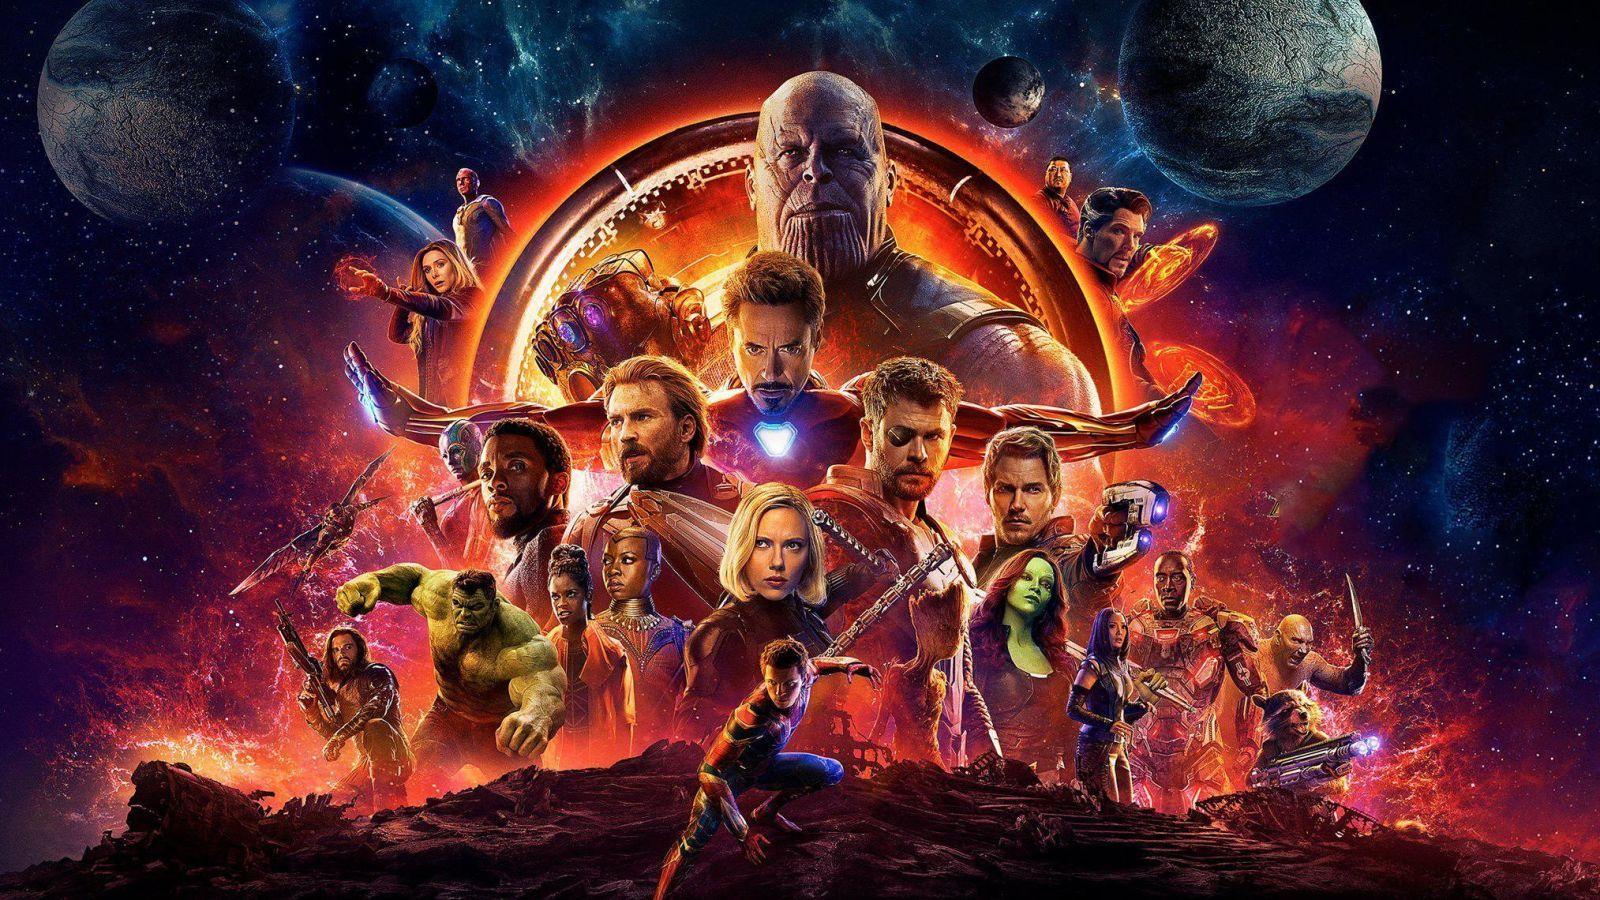 The Secrets We Learned From The Avengers Infinity War Home Release Avengers Wallpaper Marvel Cinematic Avengers